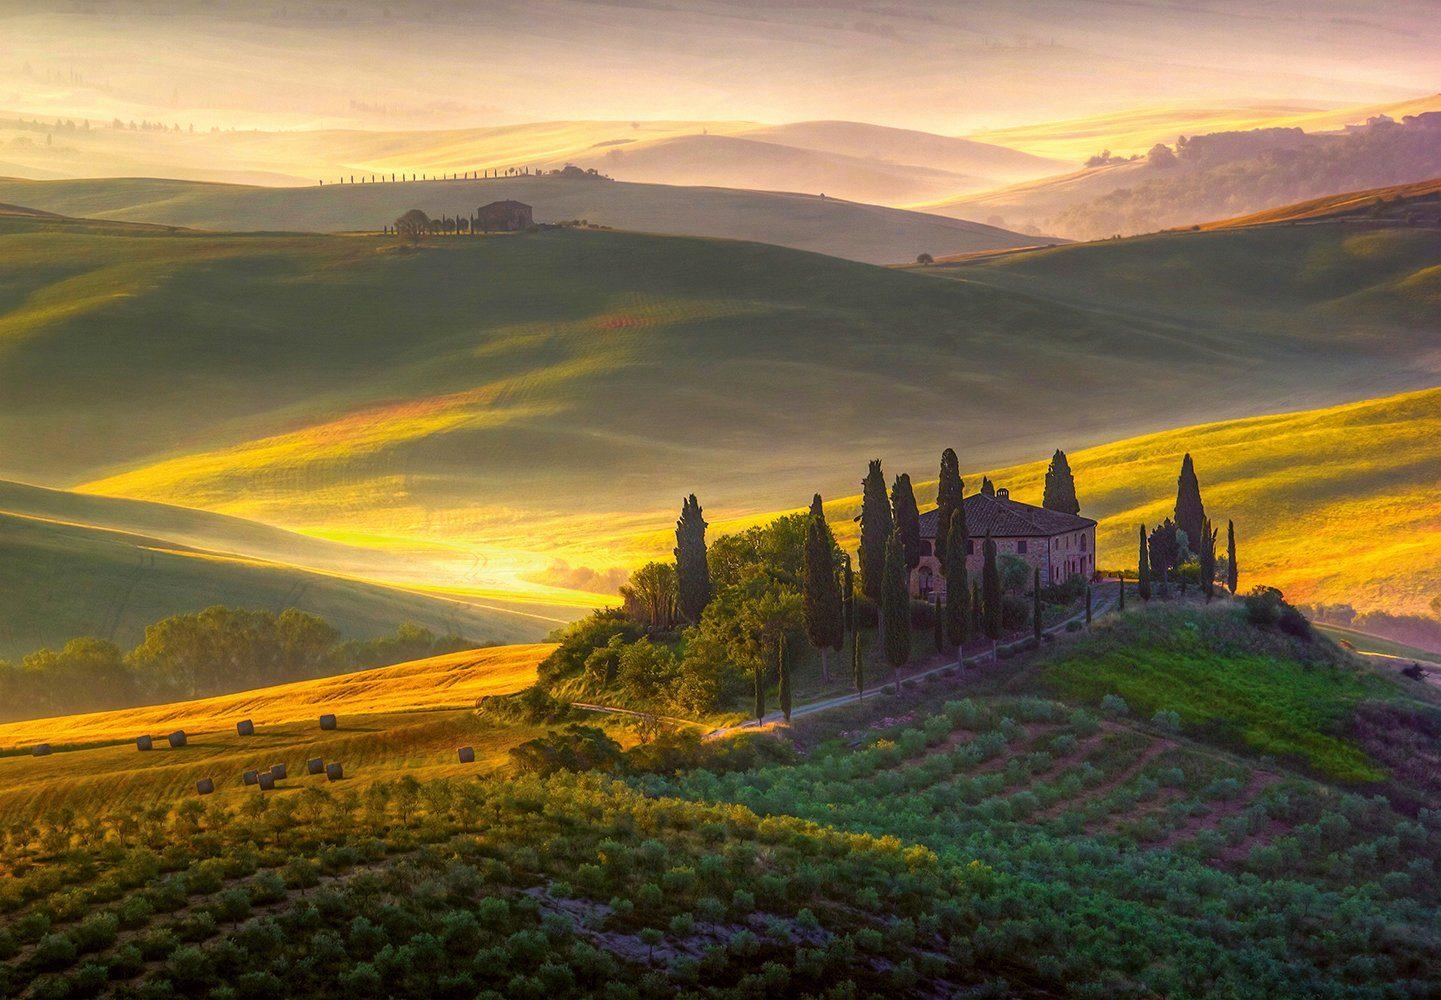 Vliestapete »Toscana«, 366x254cm, 8-teilig